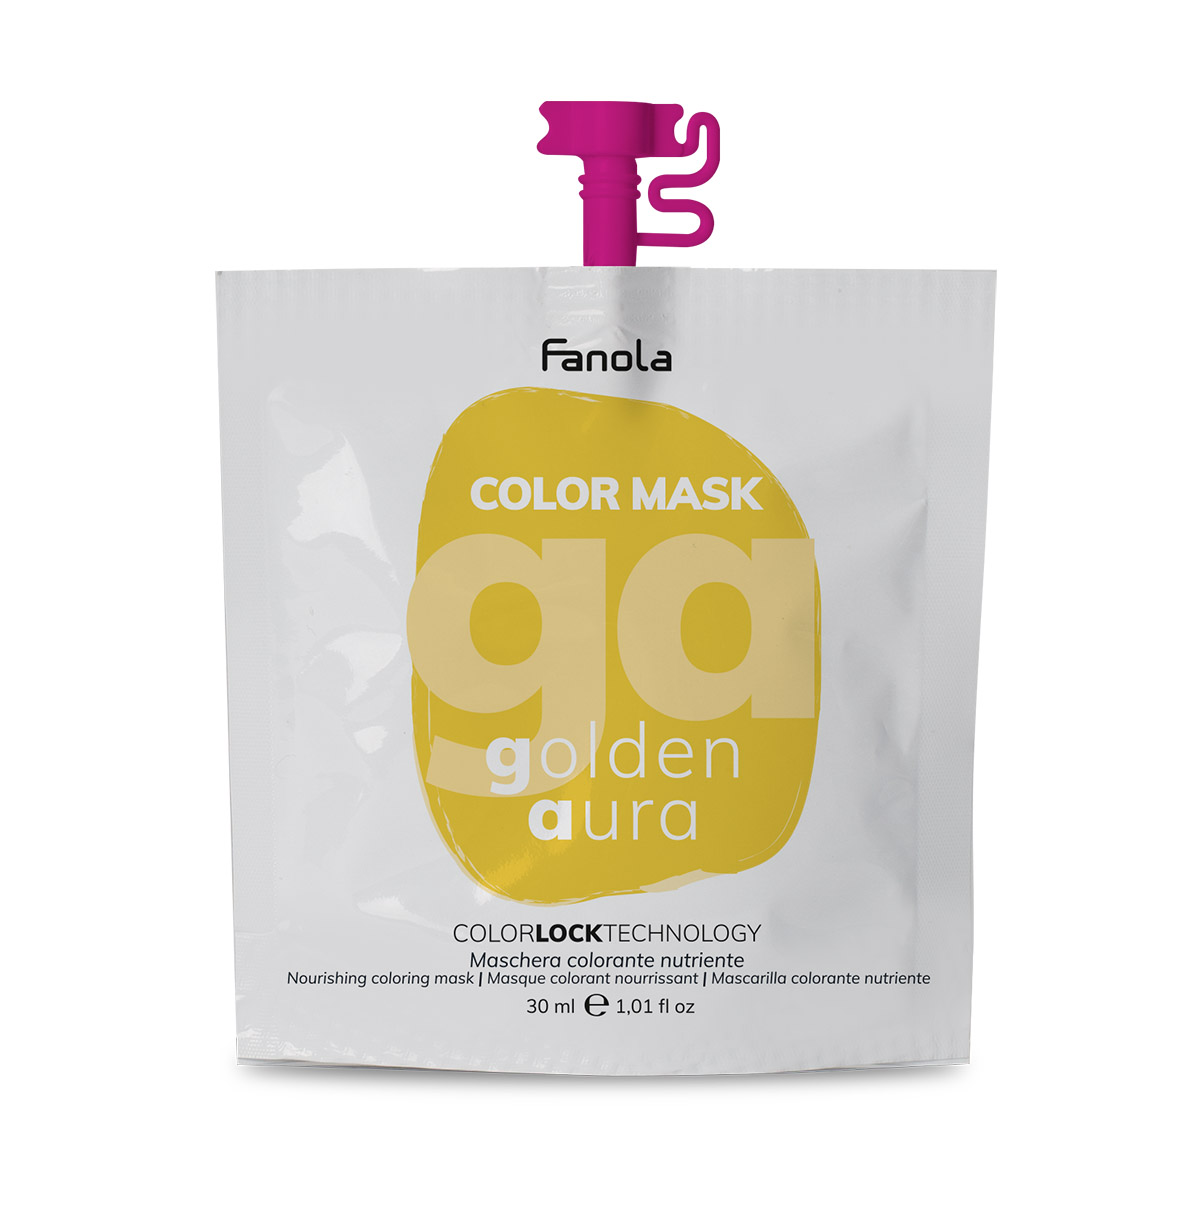 Fanola Color Mask 30ml Golden Aura (Altın Aura)